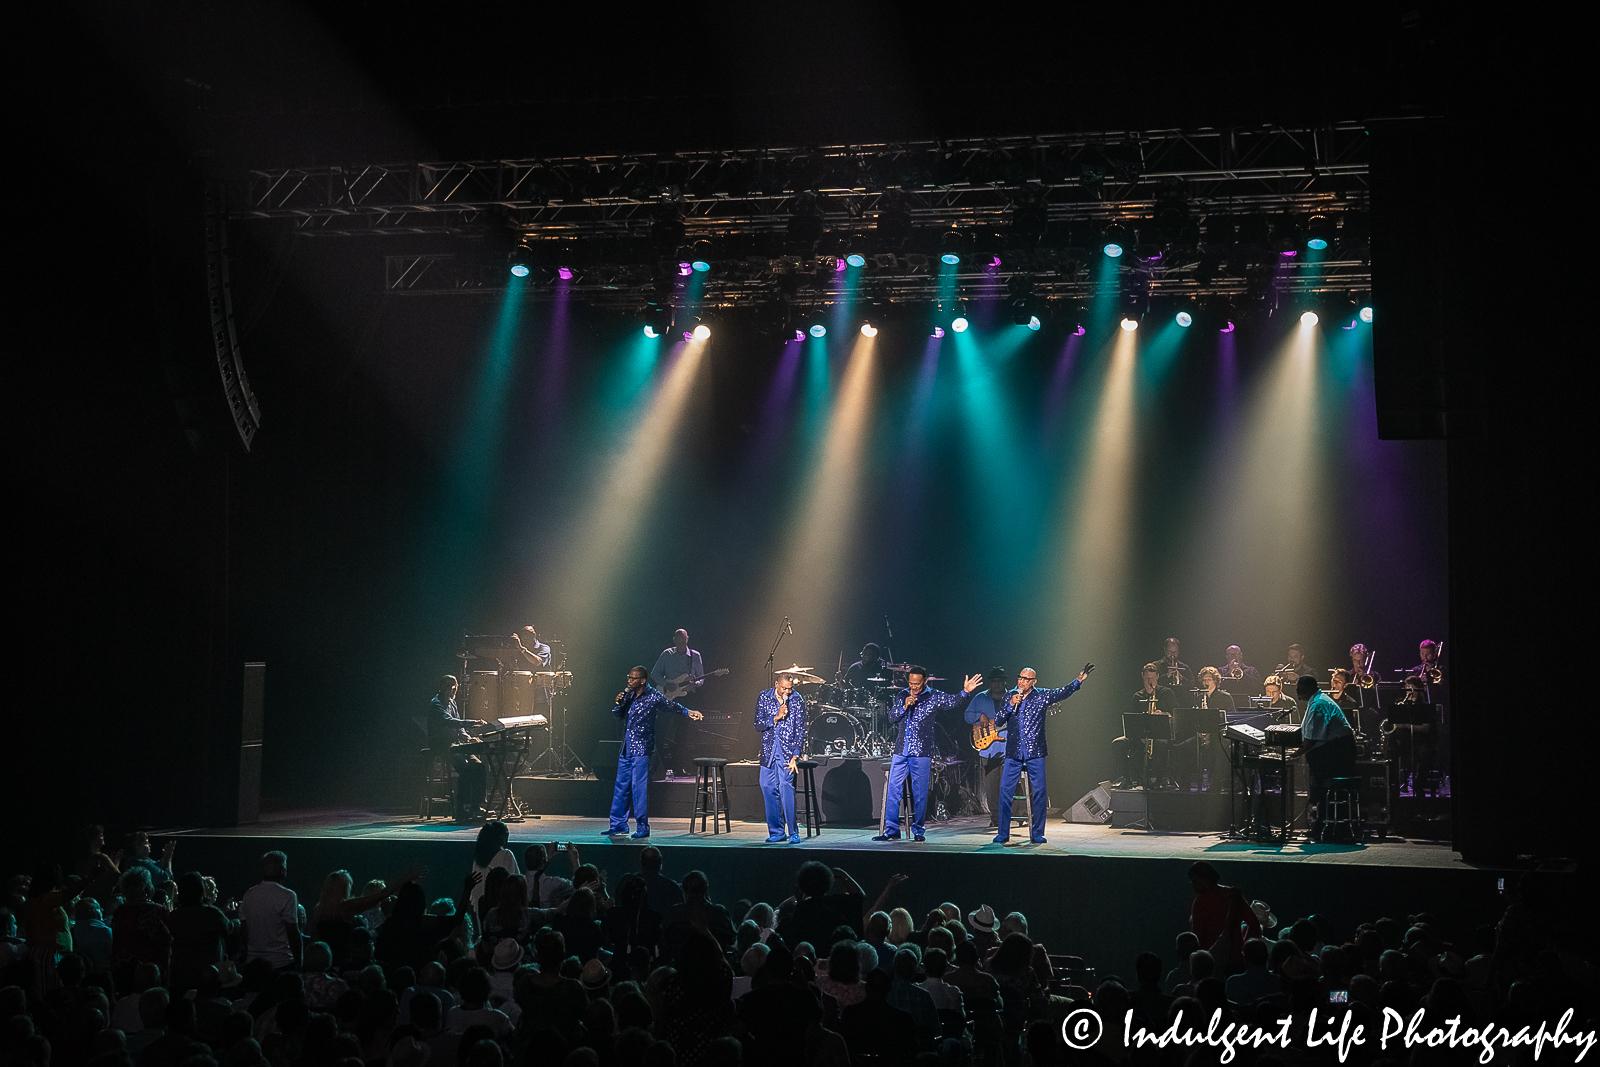 Star casino concerts isleta resort & casino